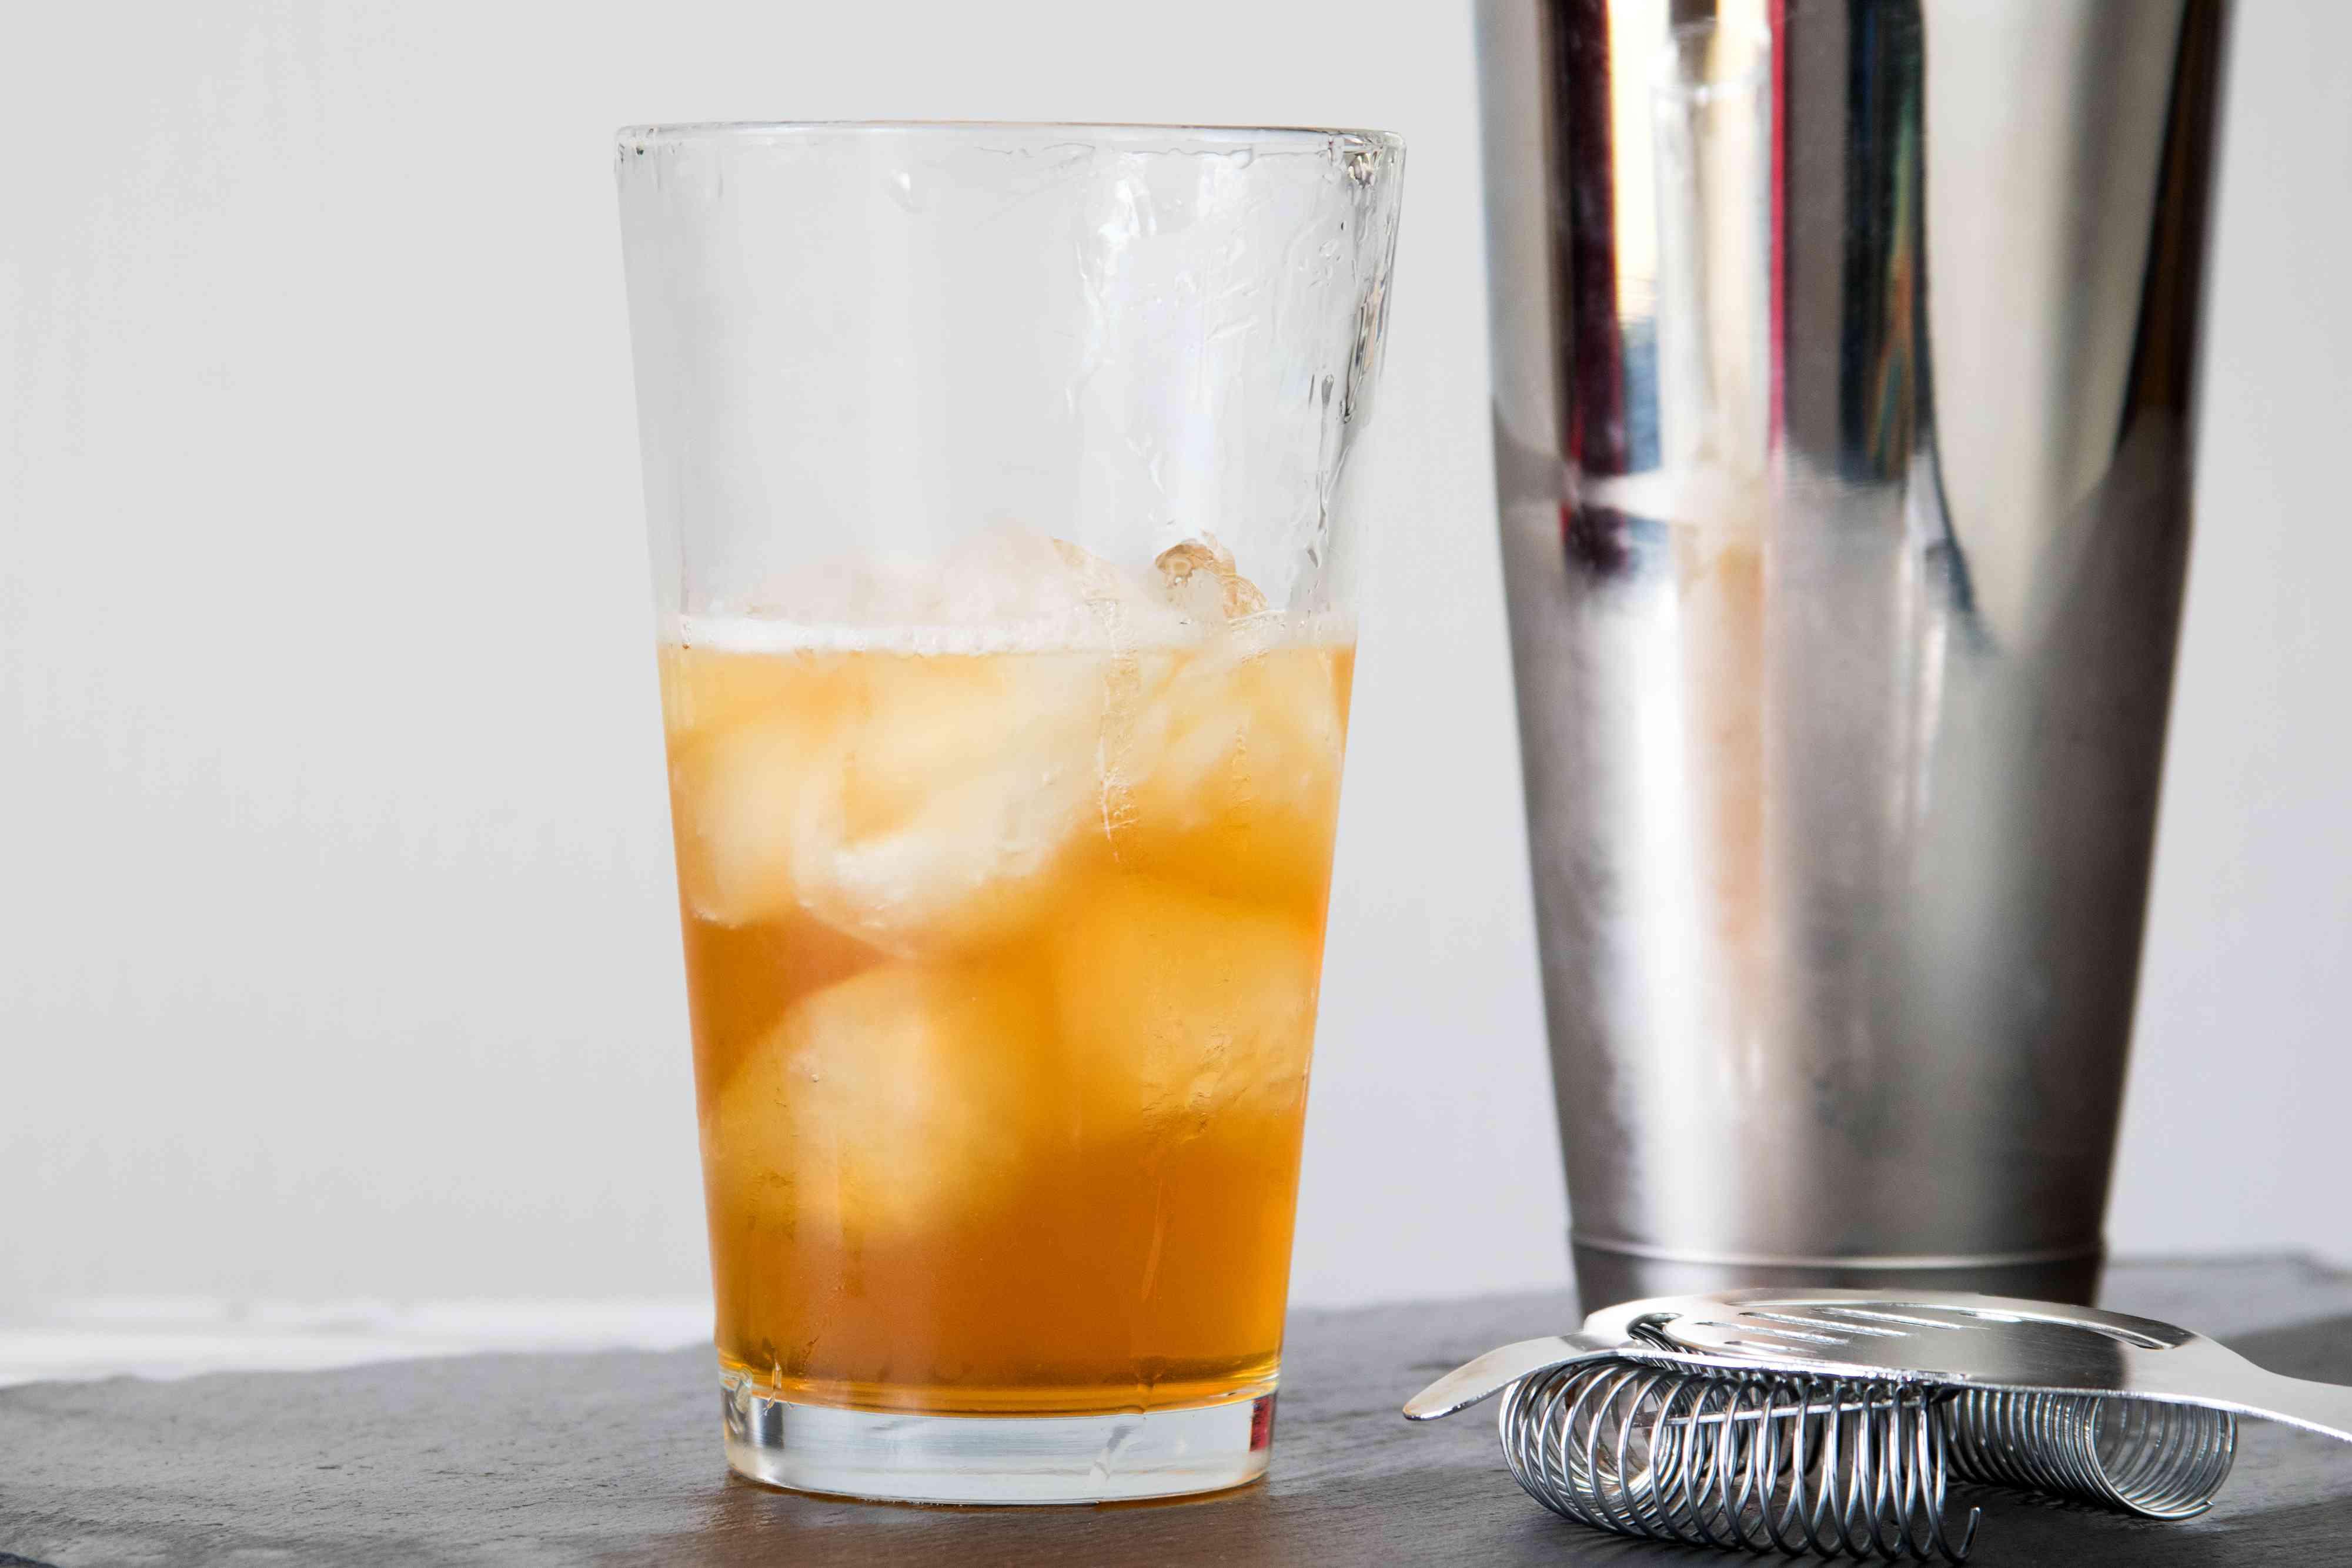 Shaking a Classic Brandy Metropolitan Cocktail